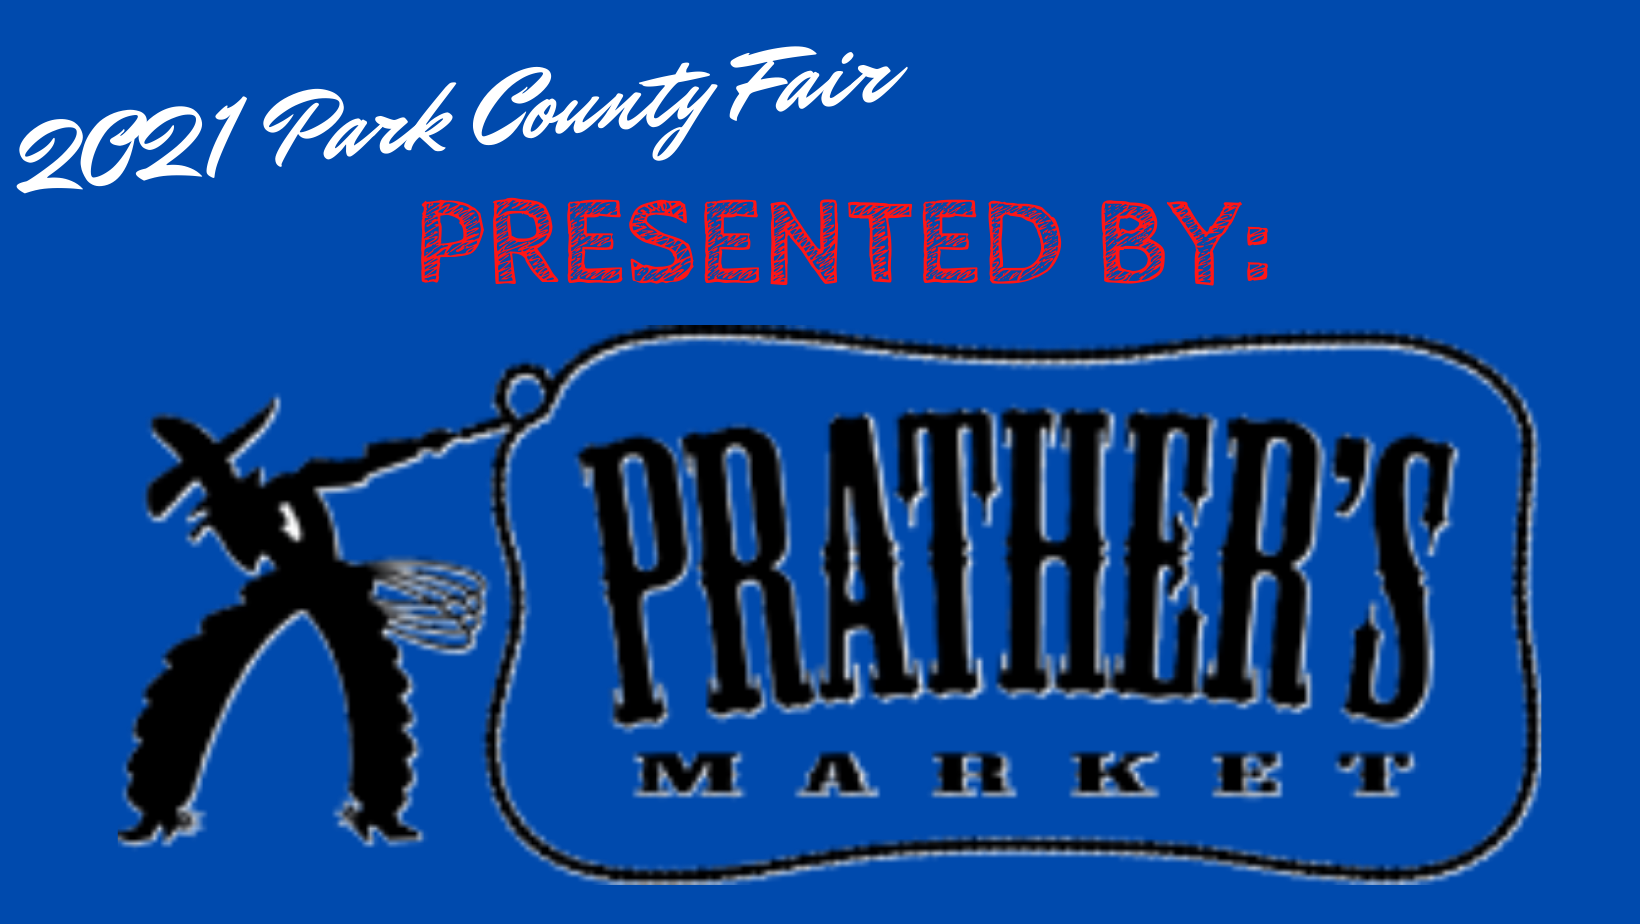 Prather's Market